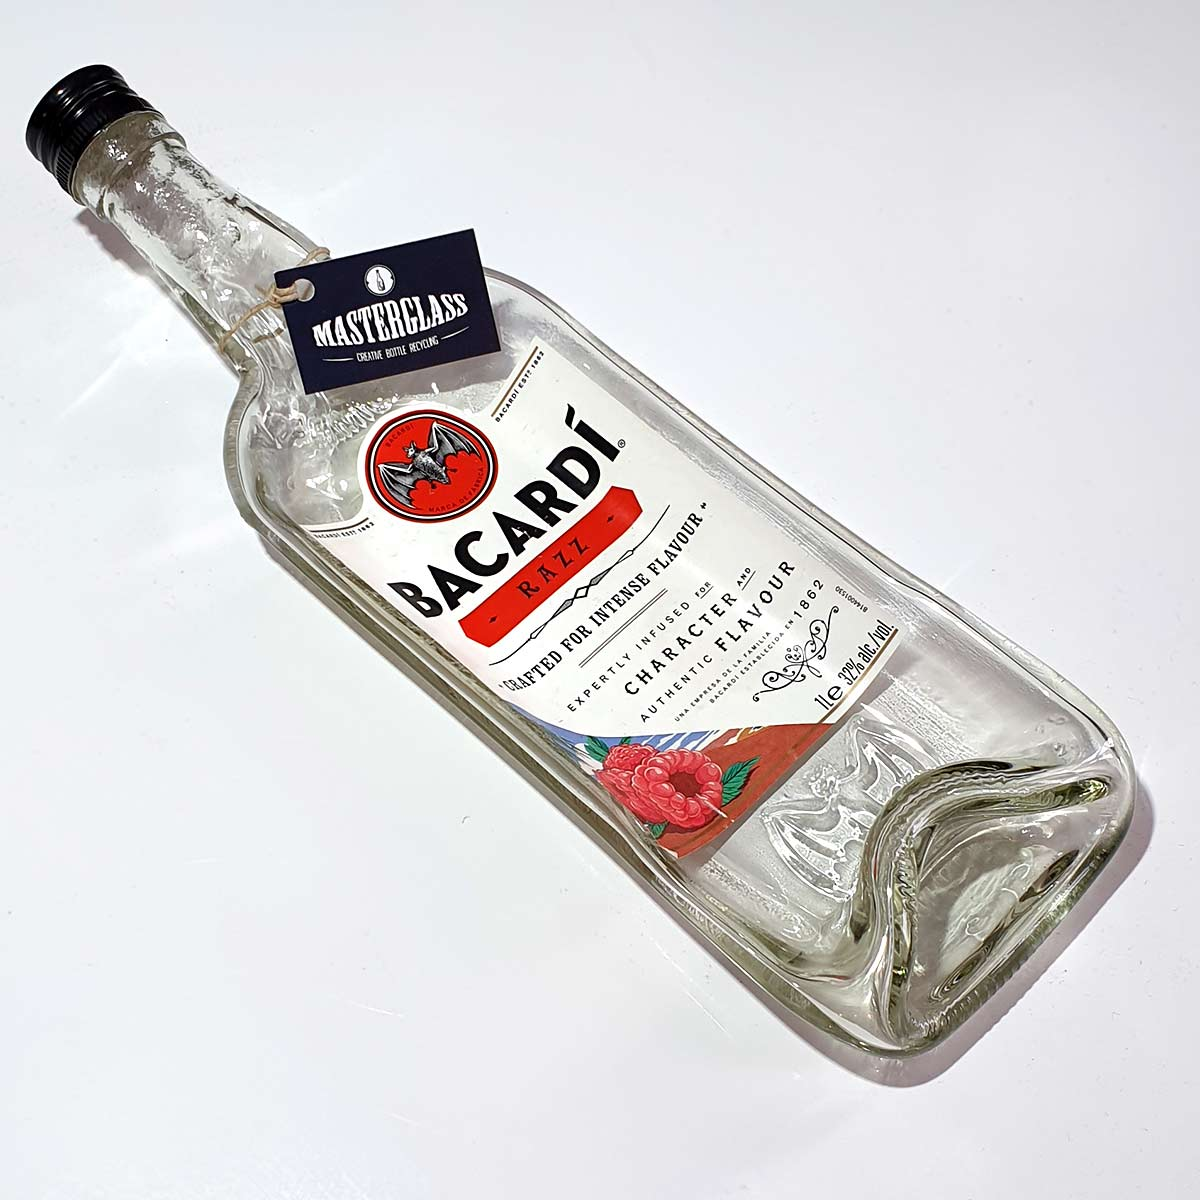 Tot borrelplank gesmolten fles Bacardi-Razz